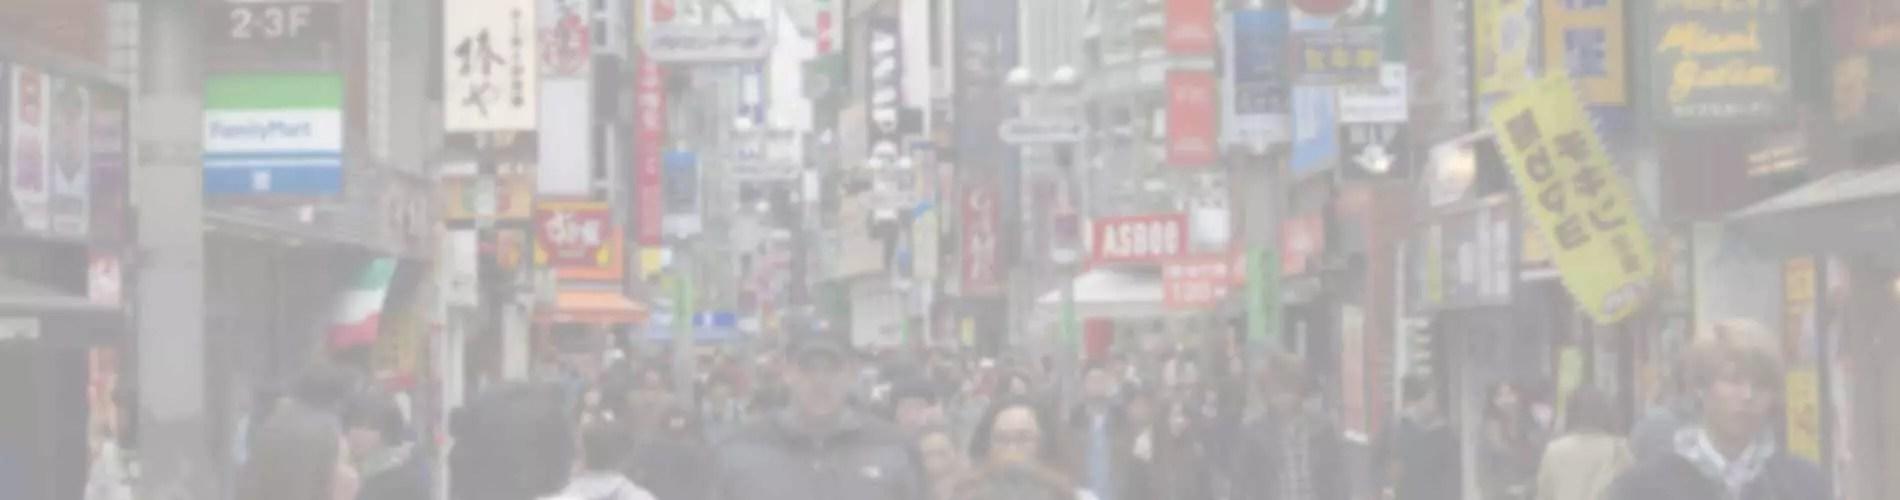 jimmycrow.com-japan-streets